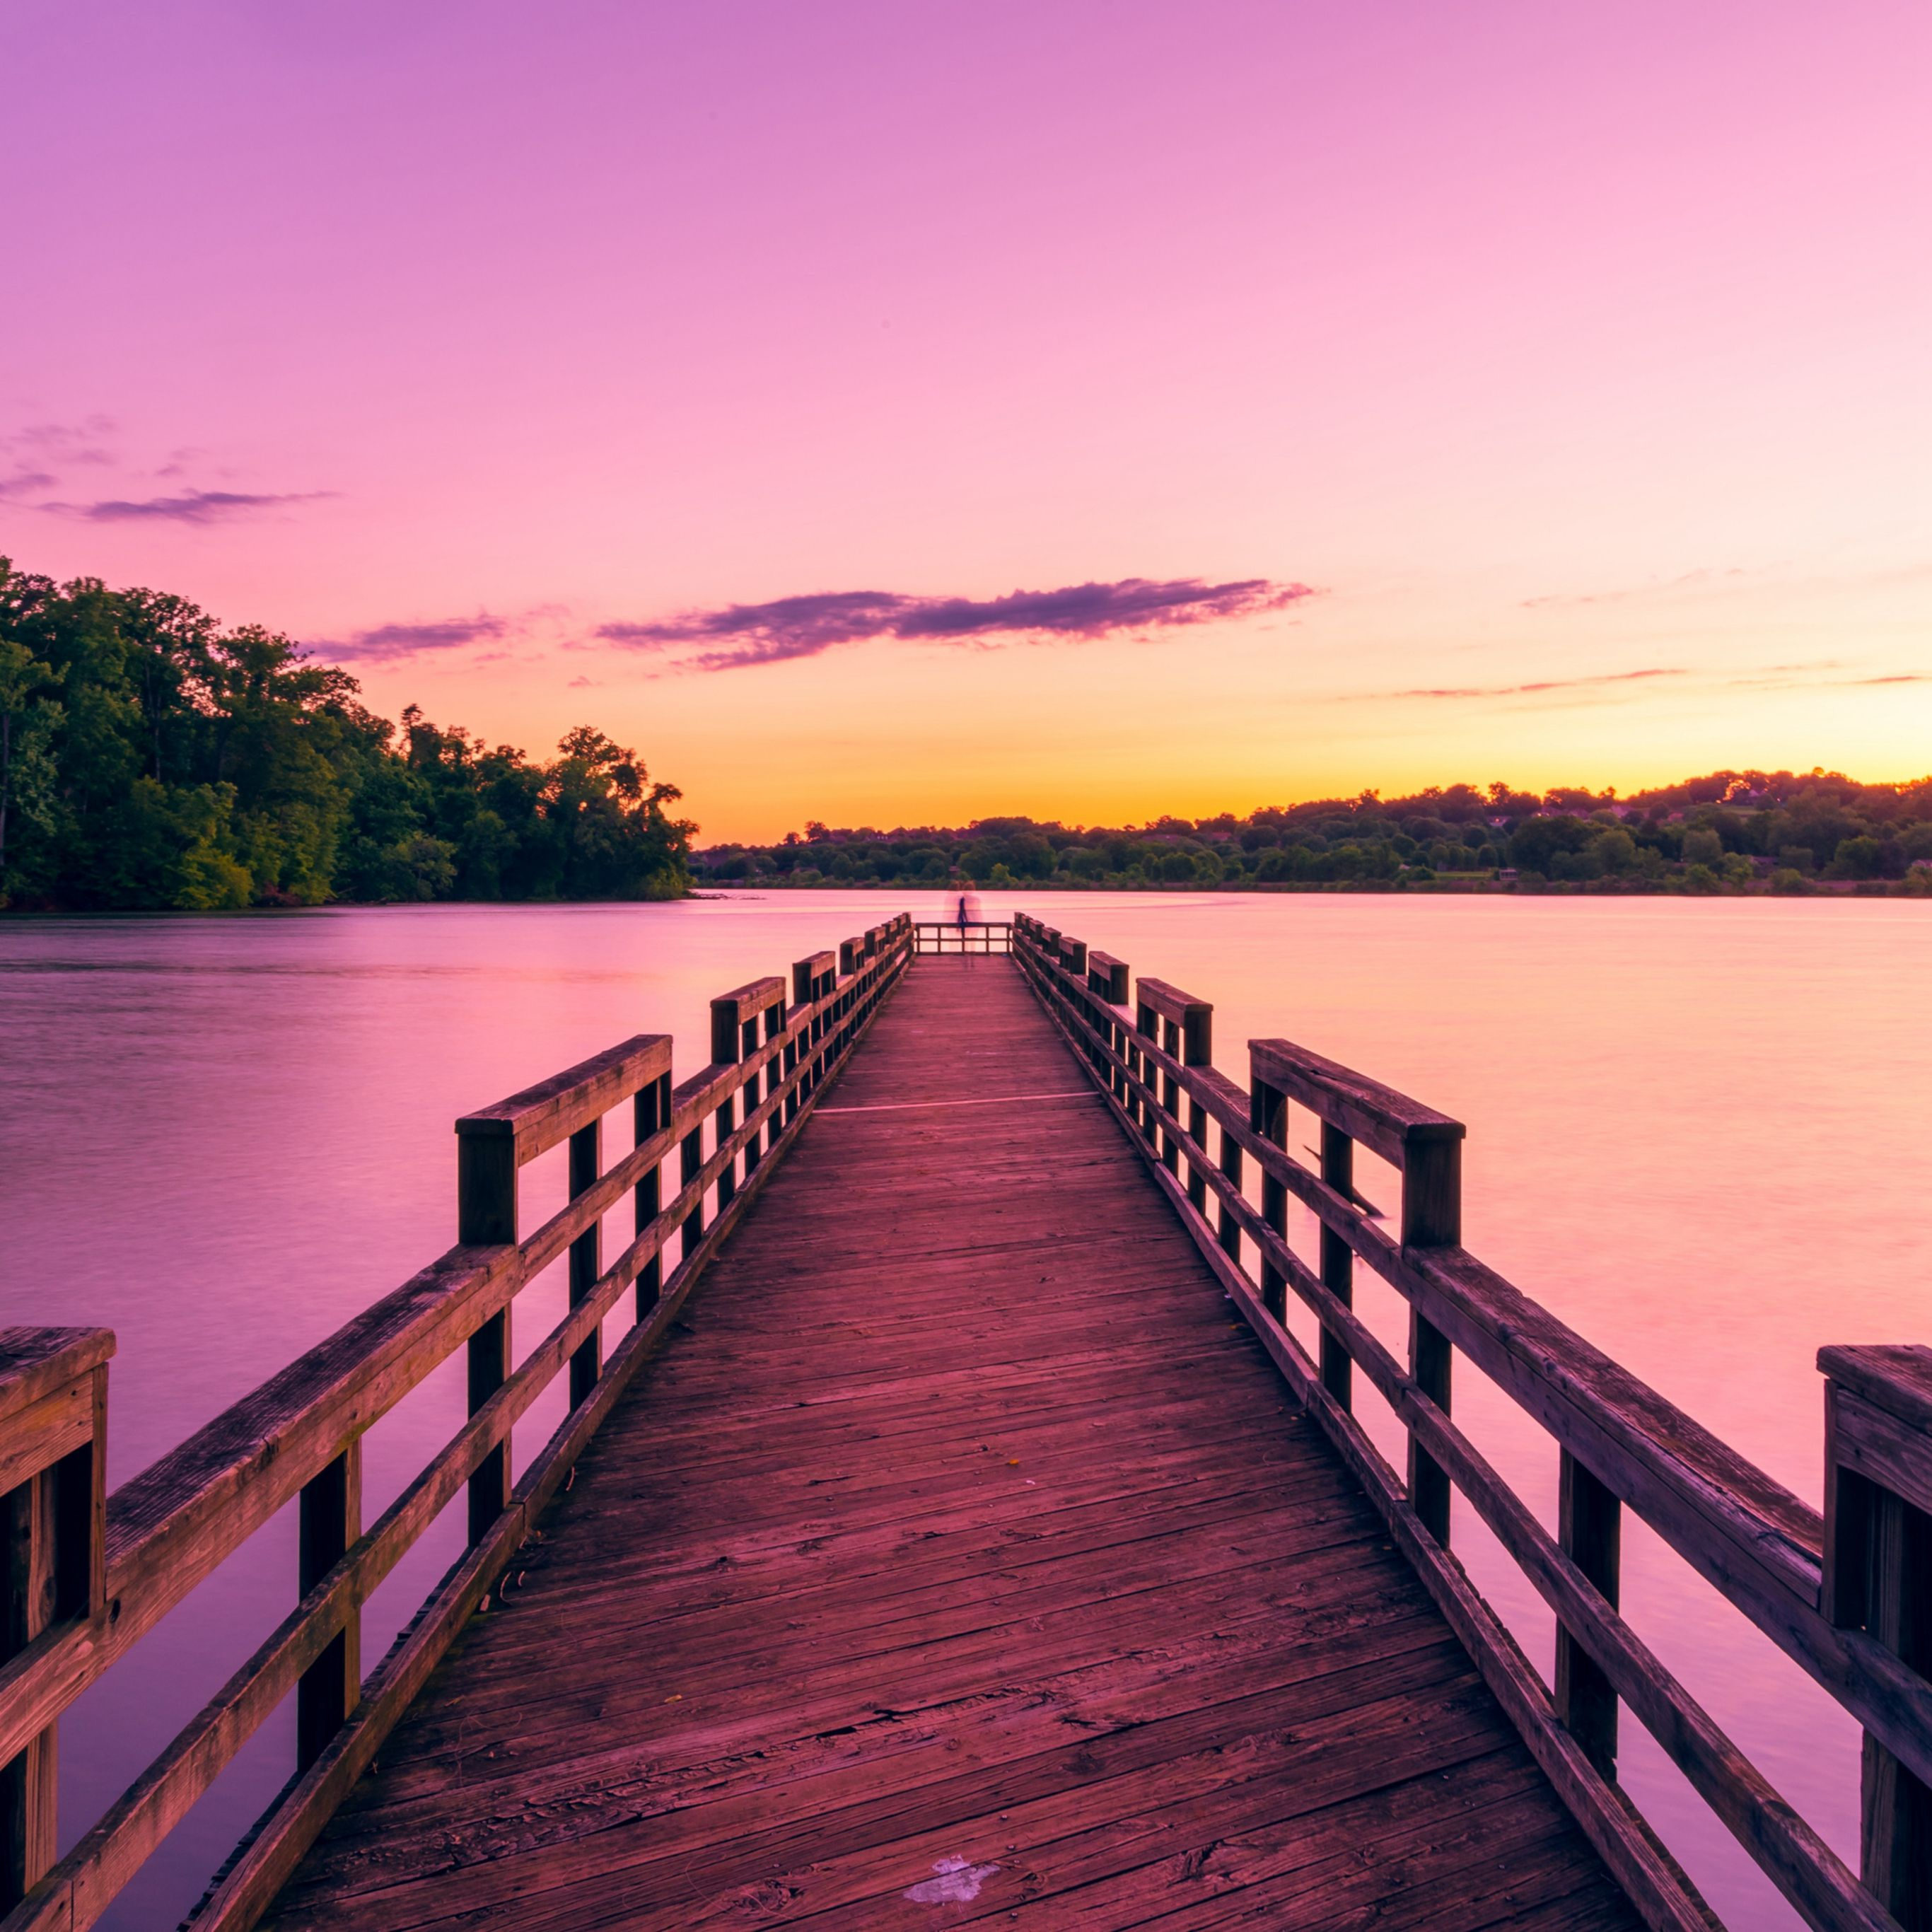 Pier Lake Sunset Sky Ipad Pro Wallpapers Sunset Sky Lake Sunset